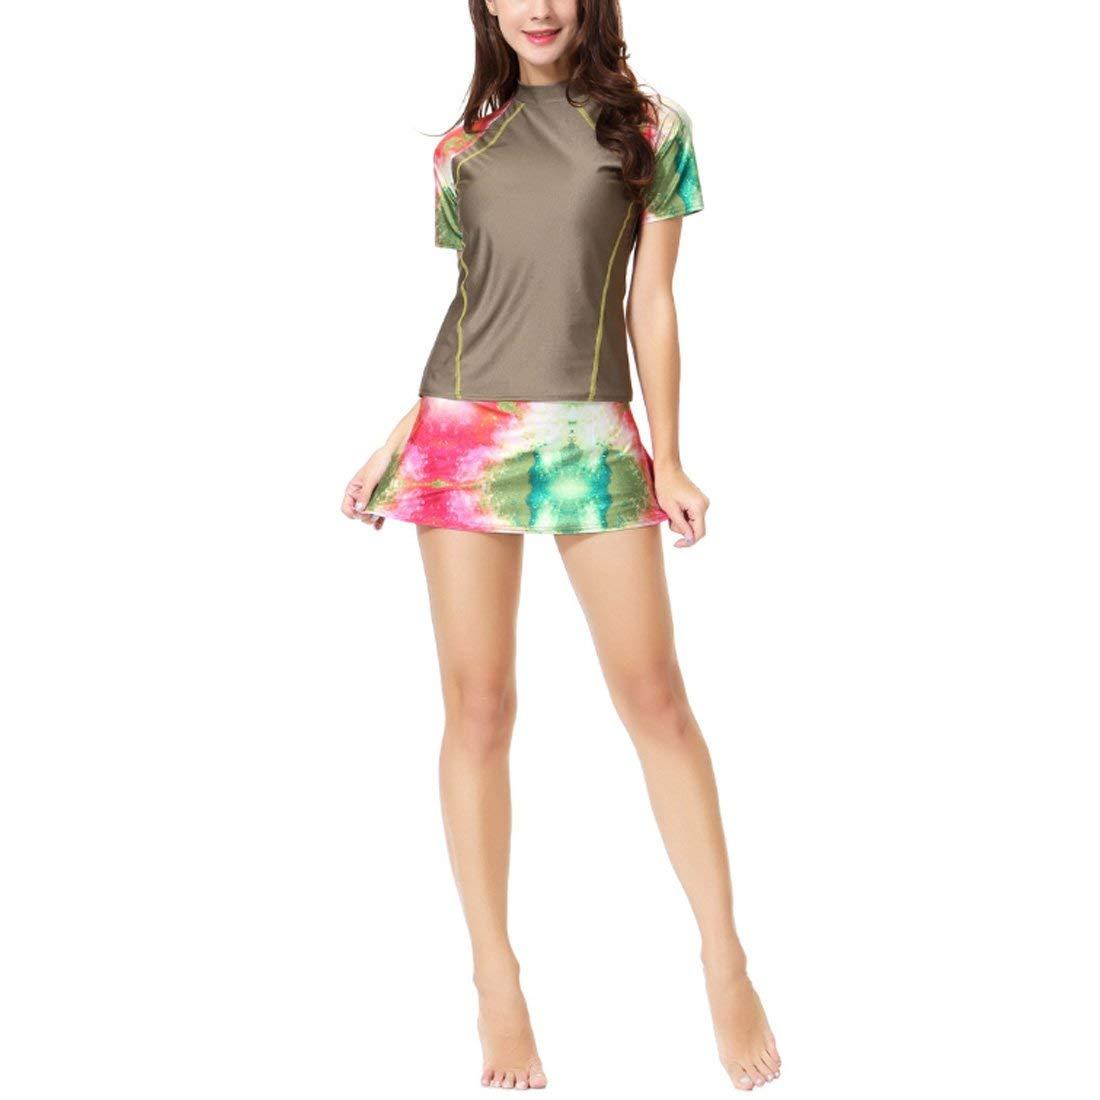 8d3c4a407b5e4 Get Quotations · Fulision Muslim Swimwear Female Summer Short-Sleeved  Splicing Zipper Swimwear